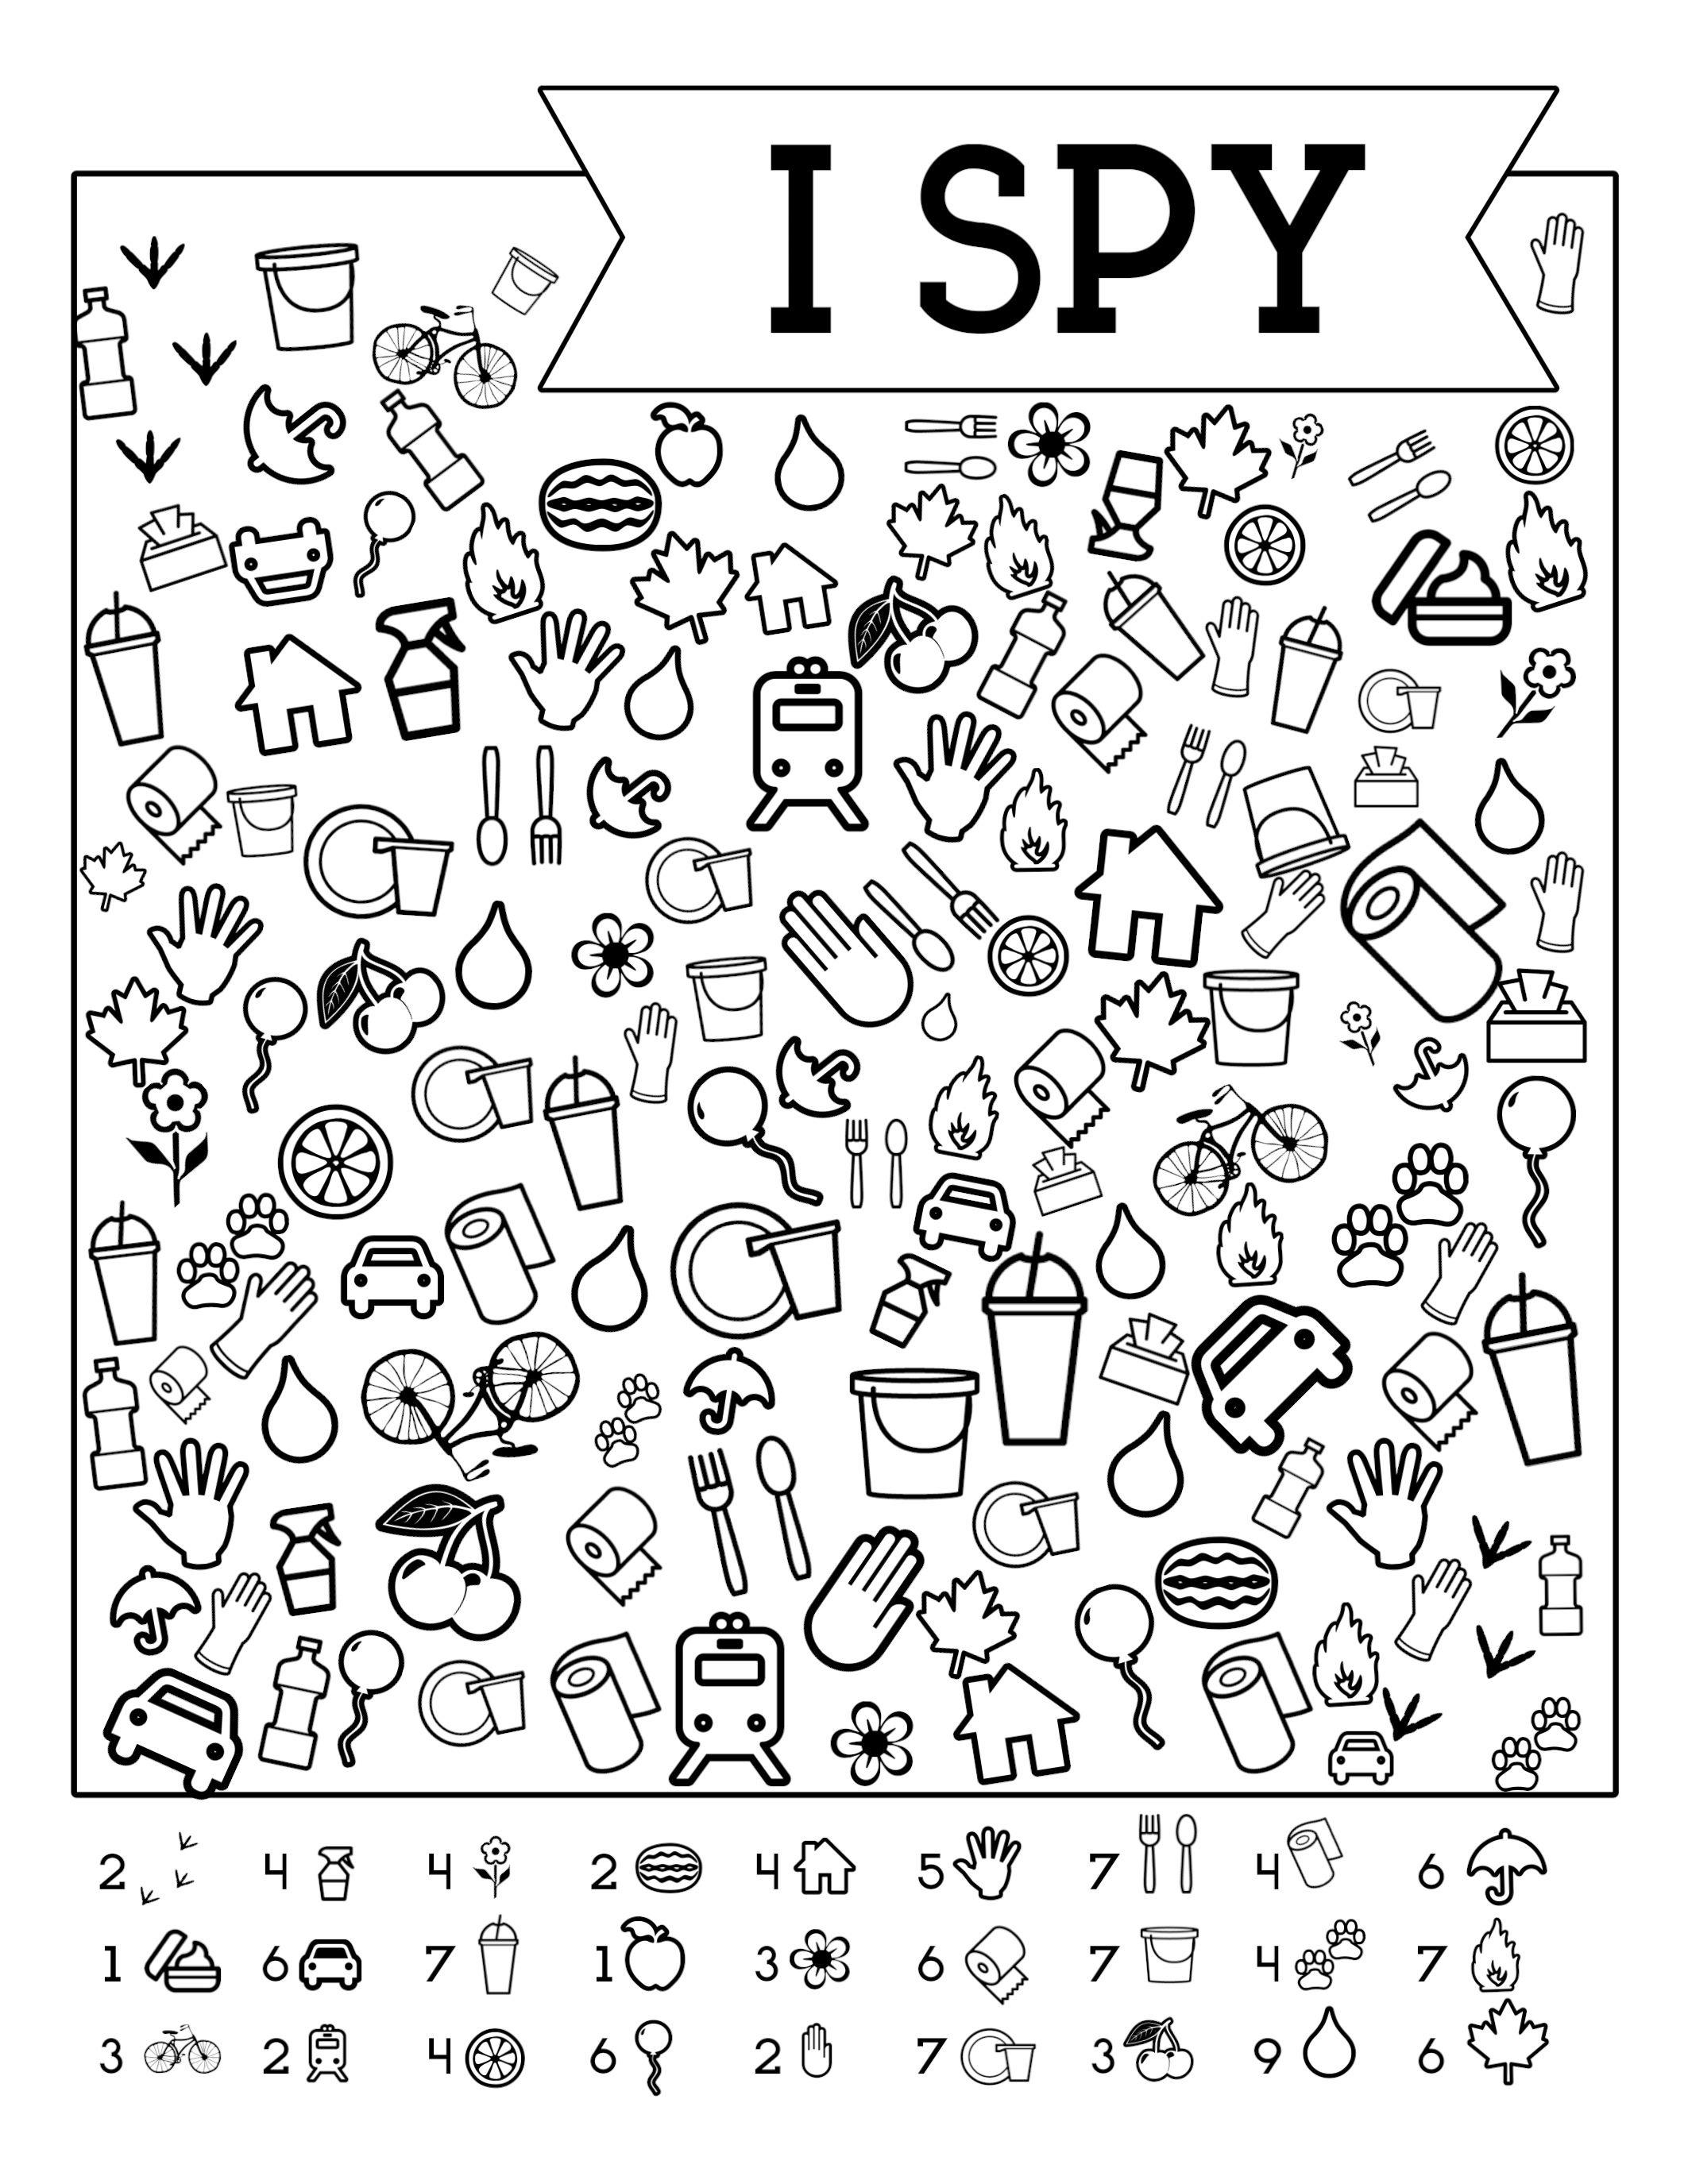 I-Spy-Free-Printable-Kids-Game | Spy School Camp | Spy Games For - Free Printable Activities For Kids